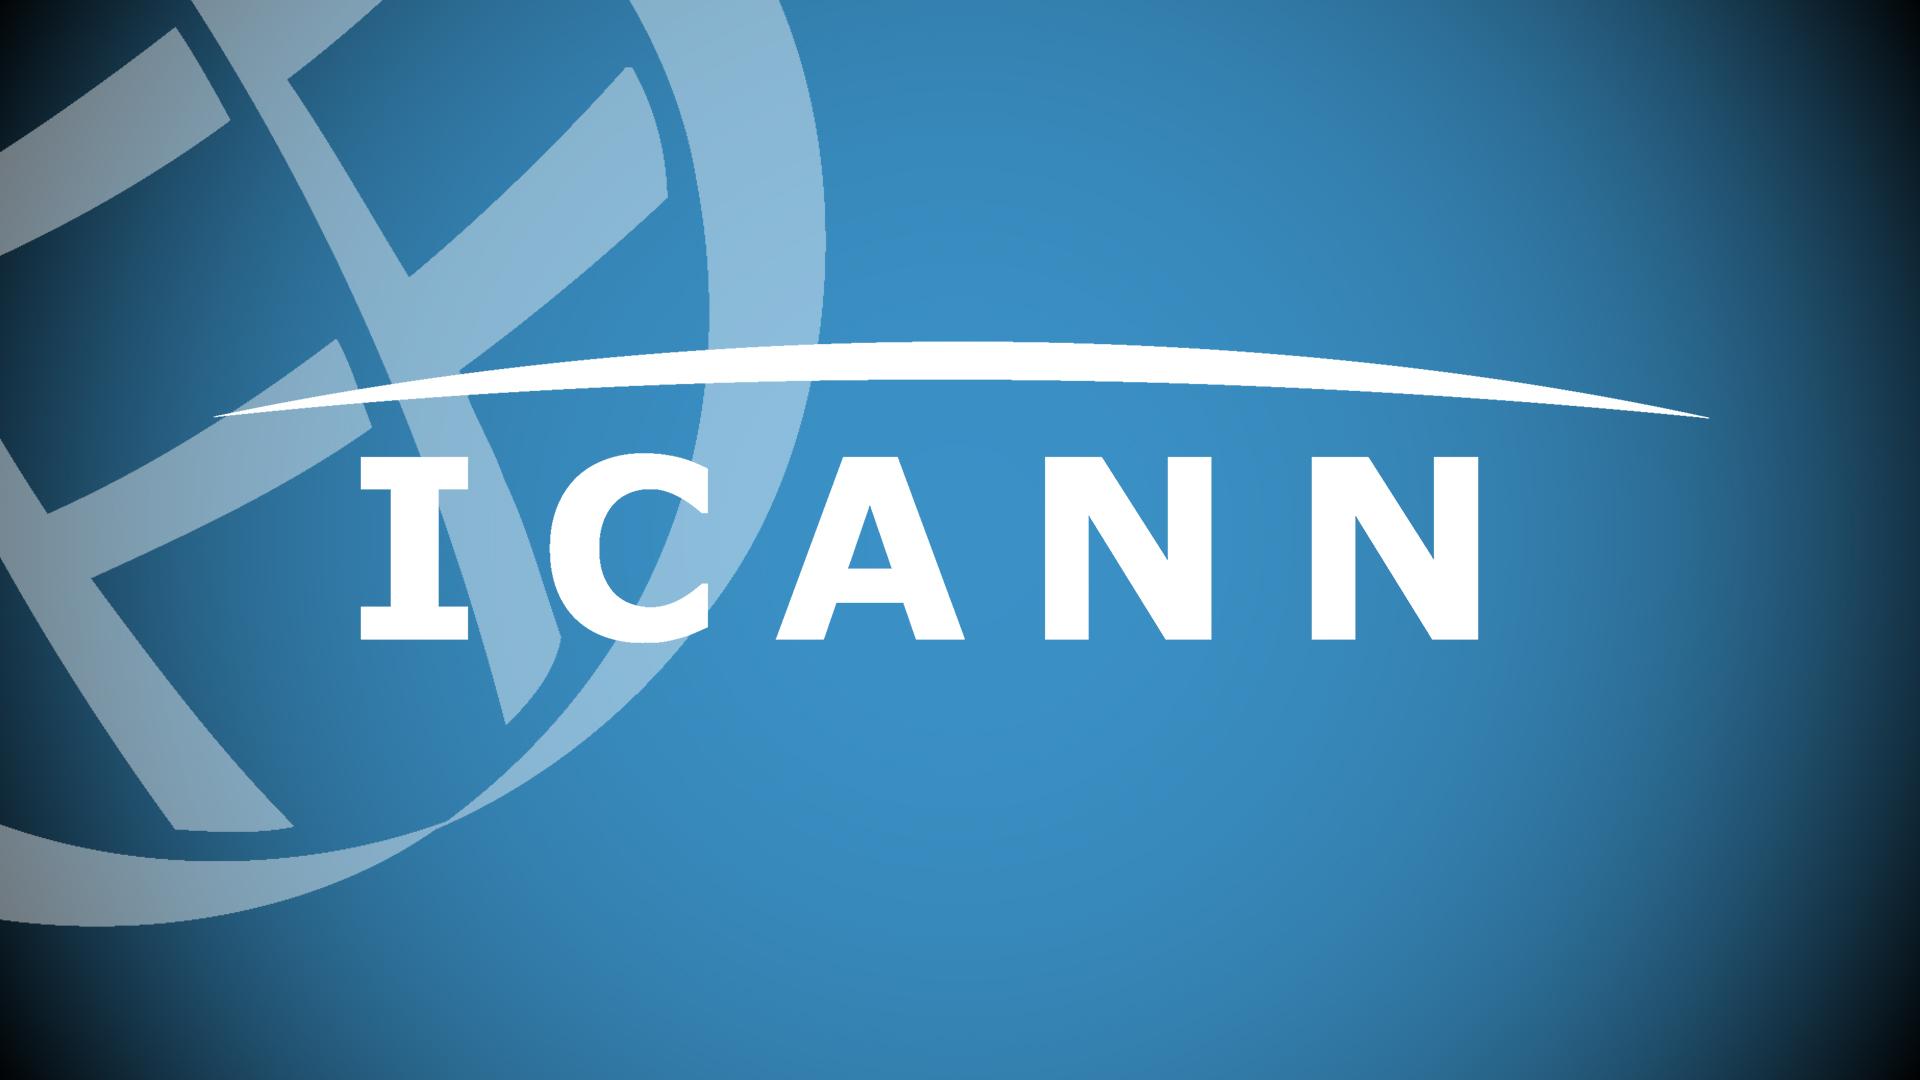 icann-understand-their-role